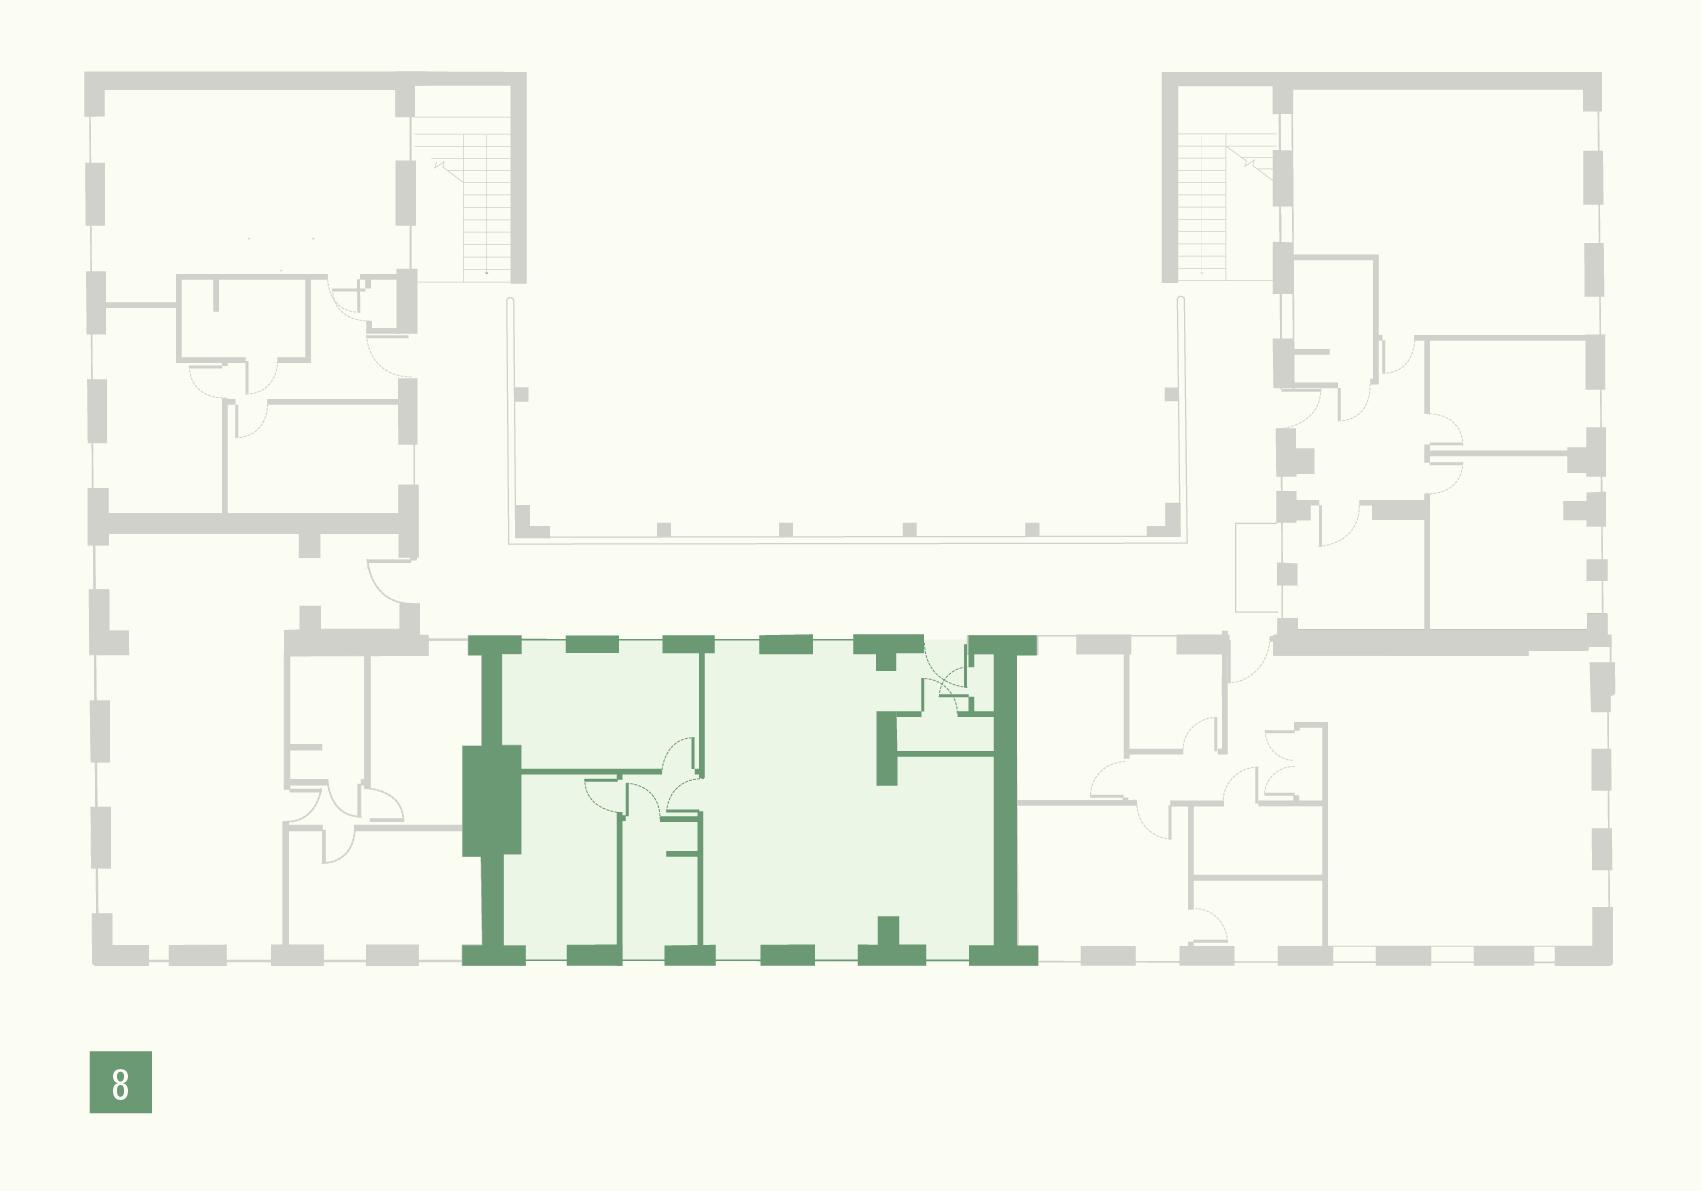 _flats_first_floor_8.png